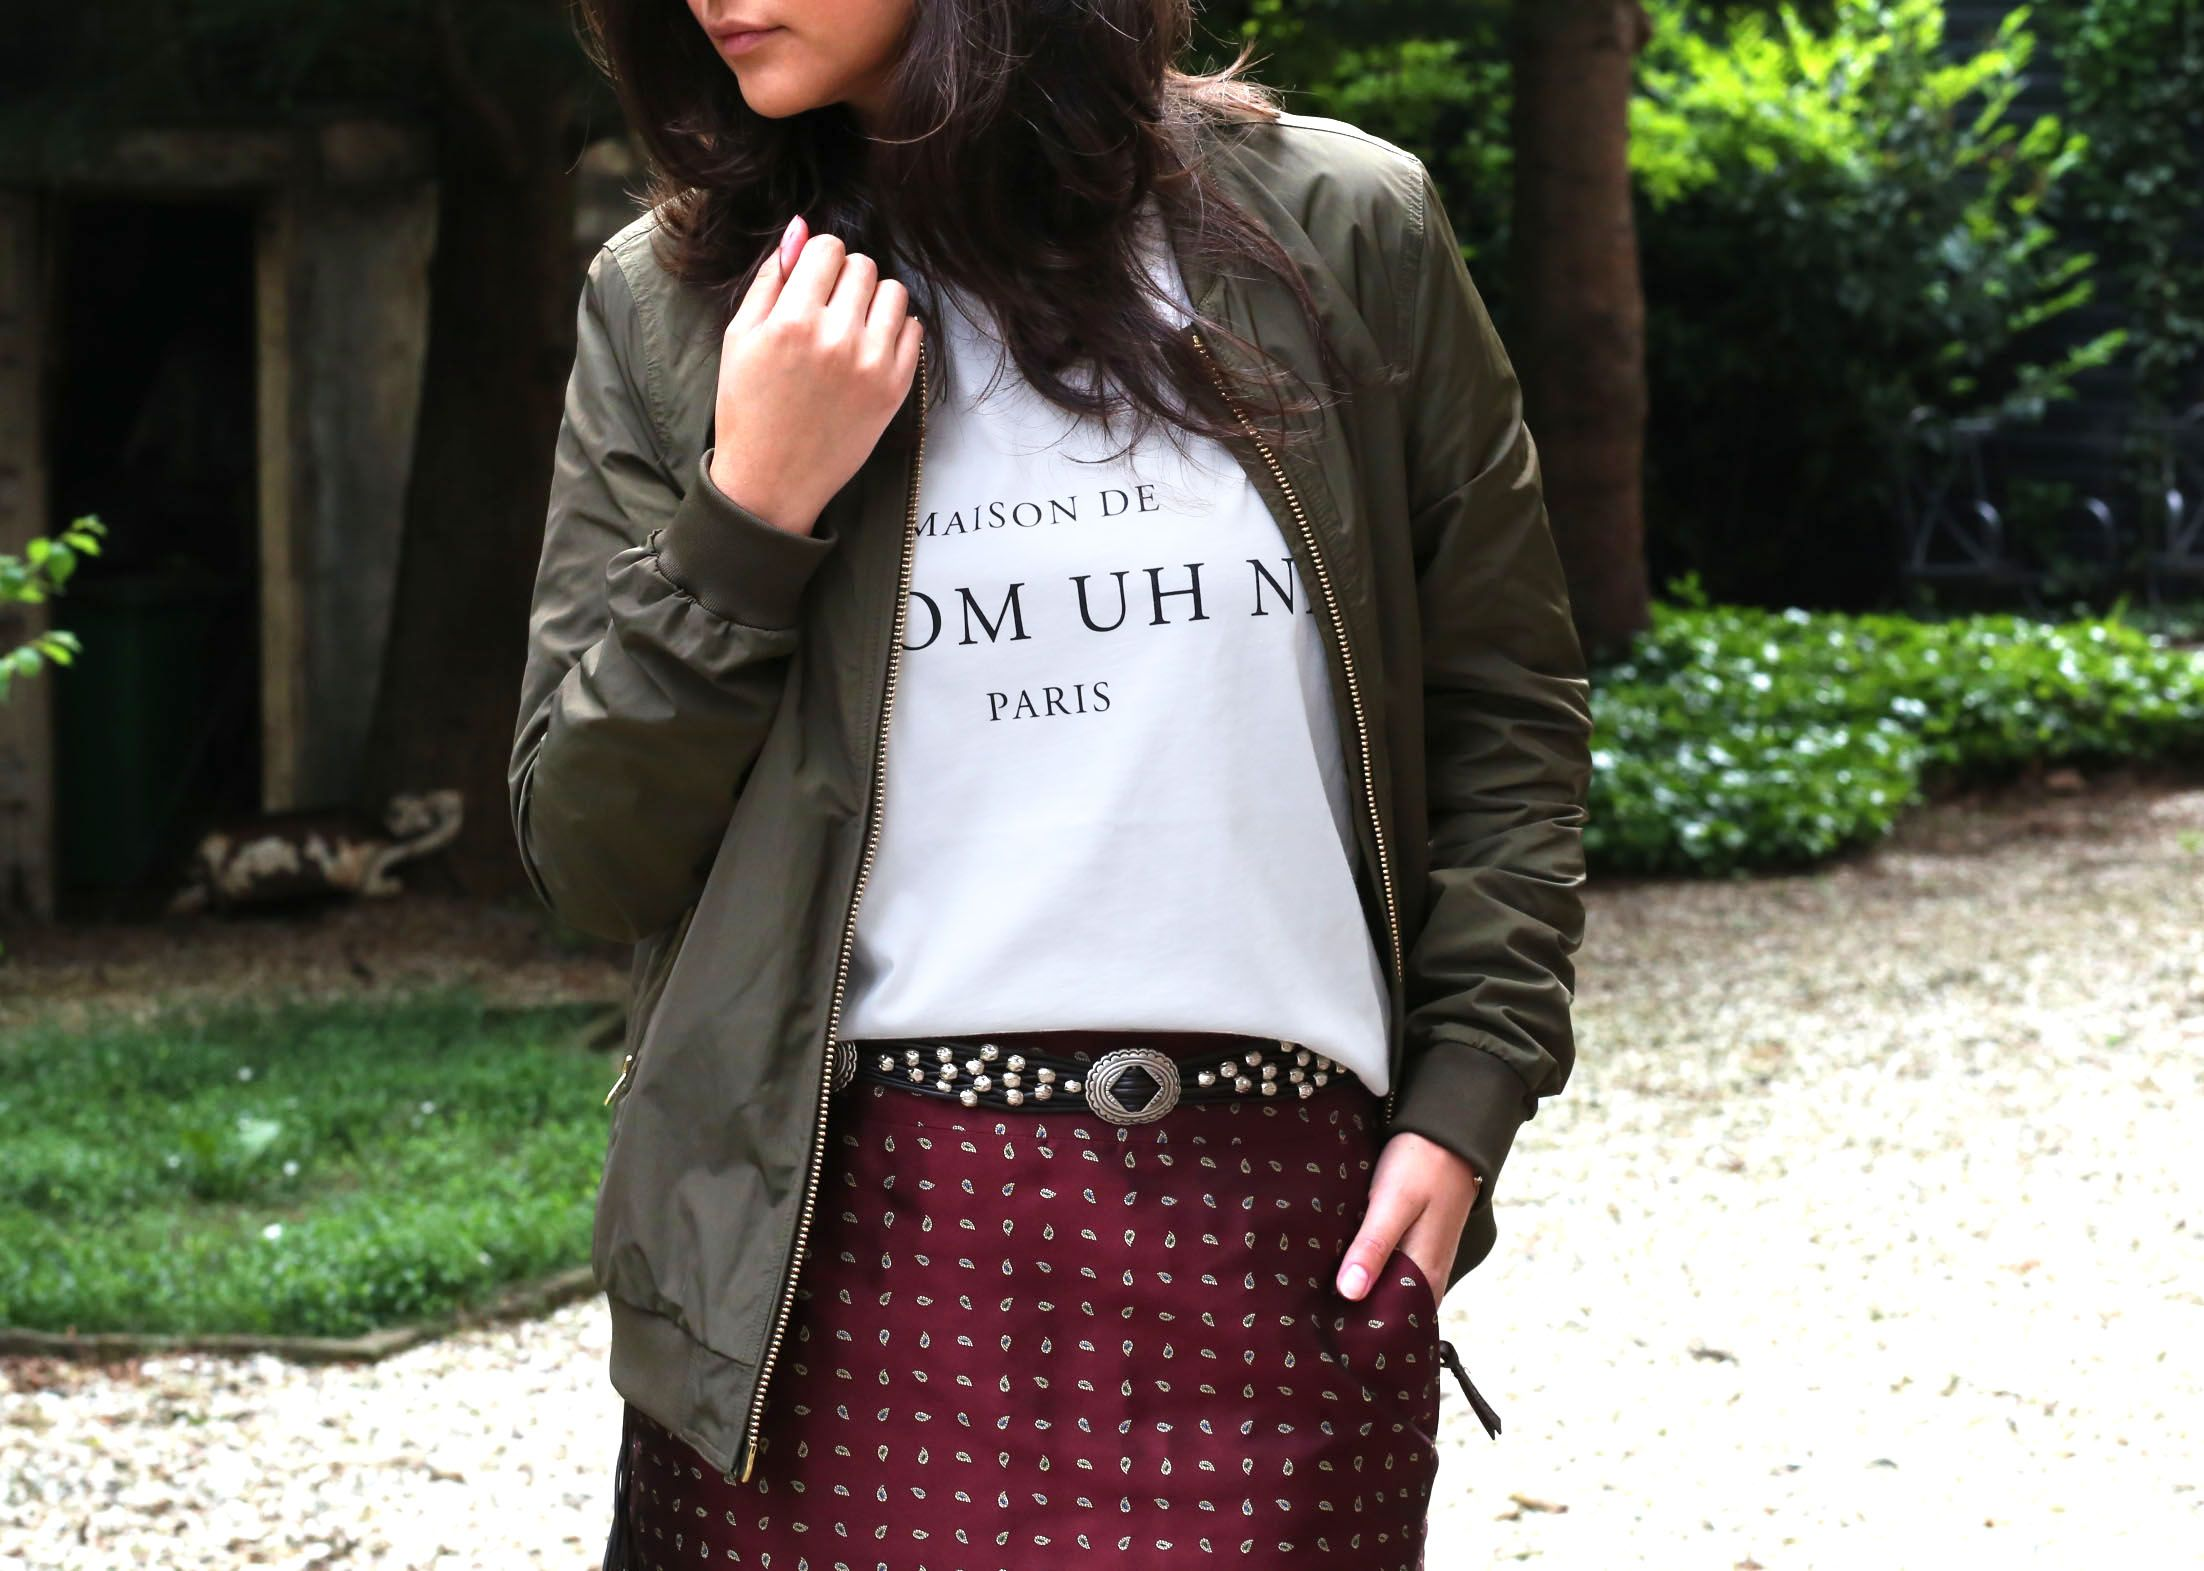 Pin by PAUW on Ih Nom Uh Nit by Pauw Amsterdam | Fashion